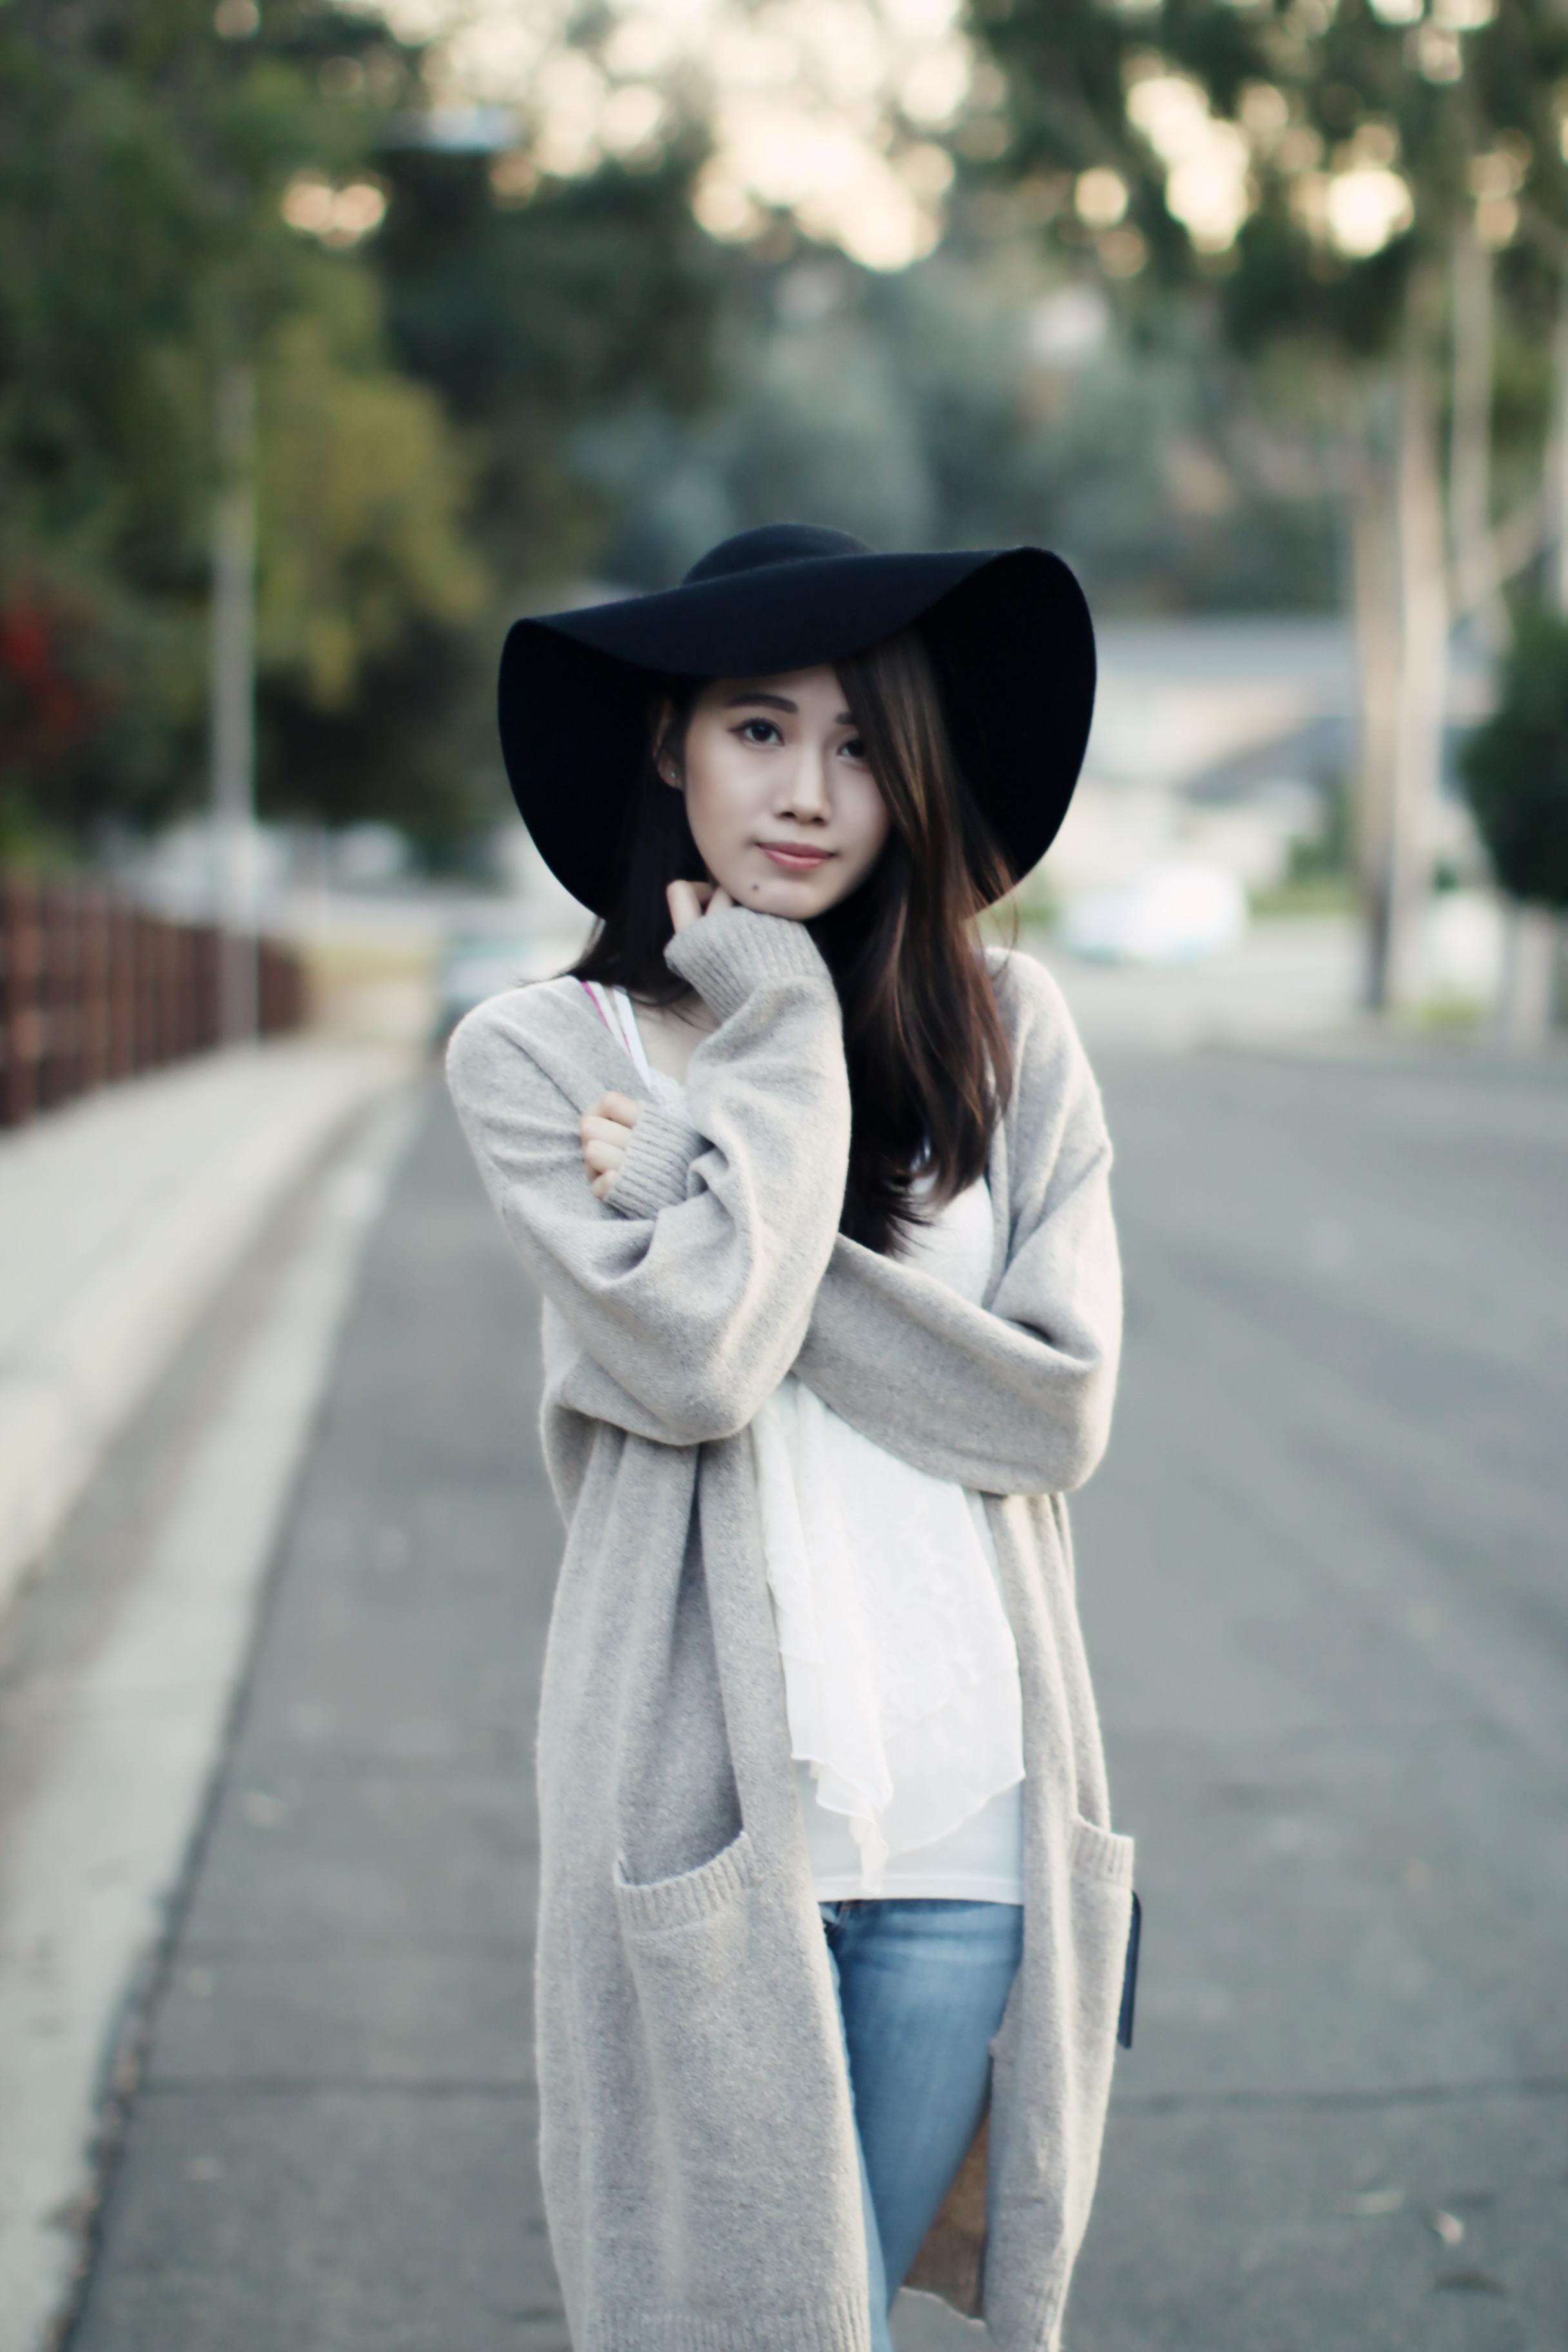 3841-ootd-fashion-style-outfitoftheday-wiwt-nordstrom-abercrombie-bohemian-fallfashion-forever21-f21-f21xme-koreanfashion-elizabeeetht-clothestoyouuu